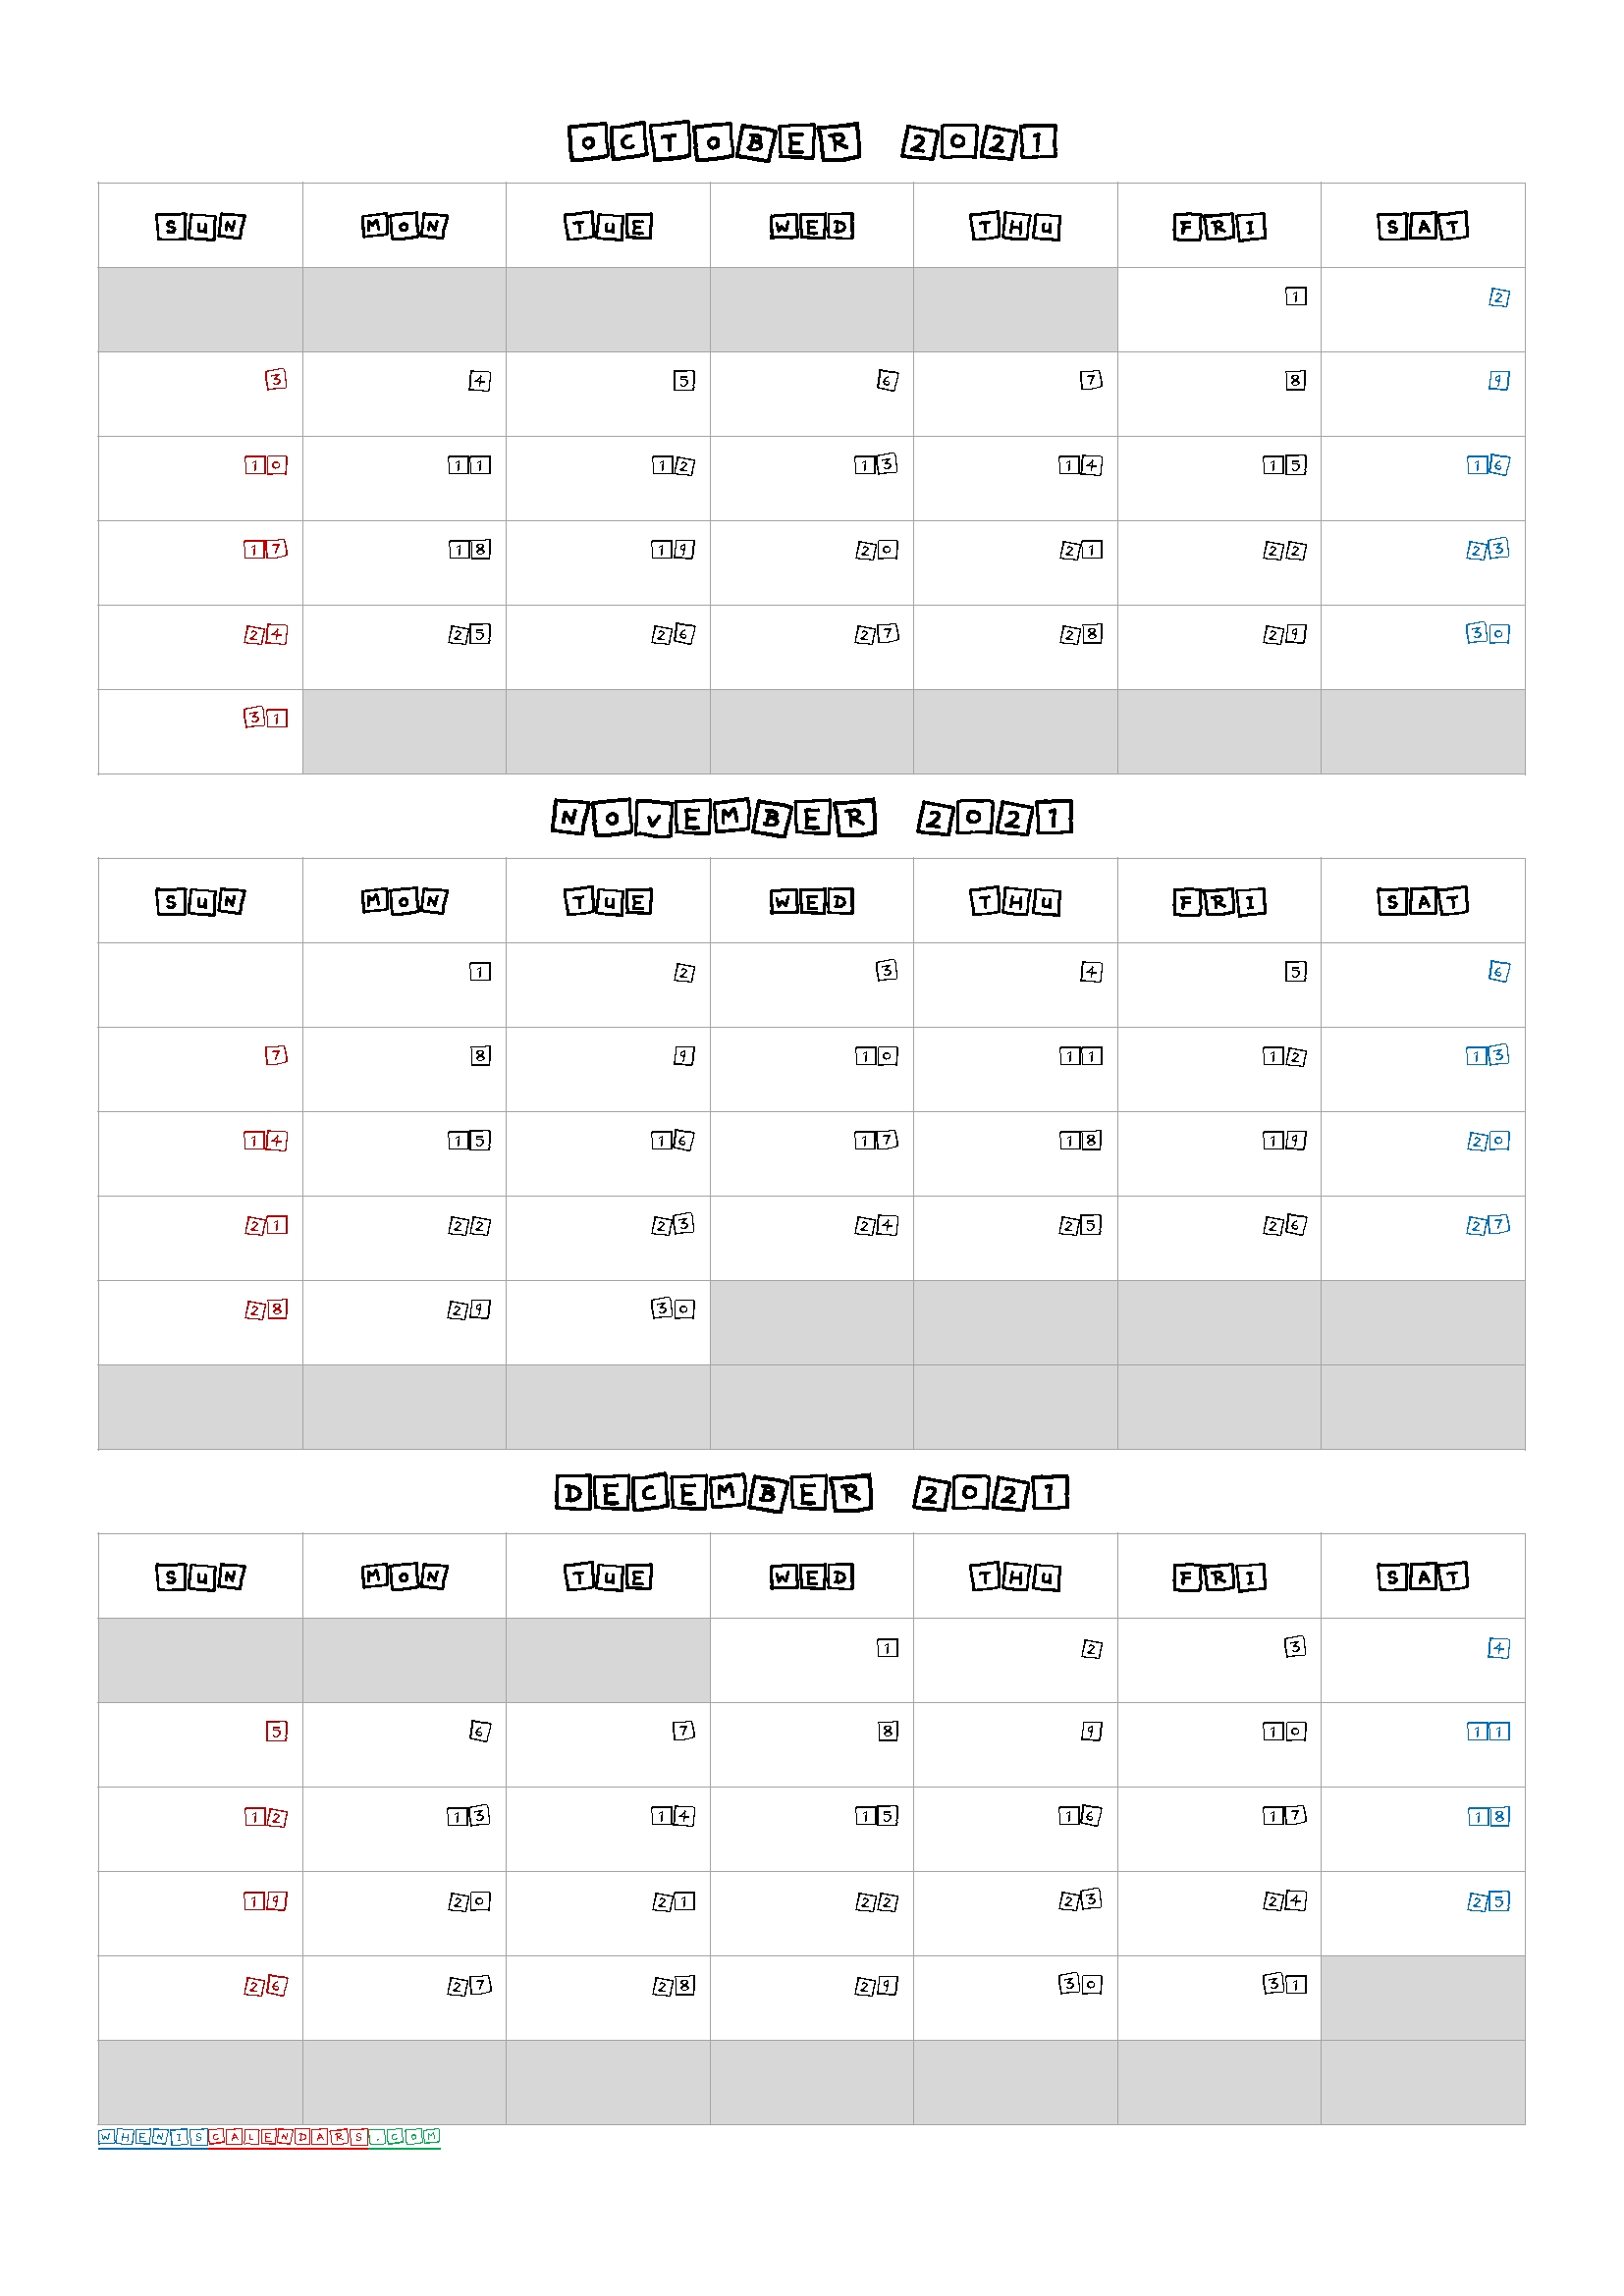 Calendar For October November December 2021 | Printable March October November December 2021 Calendar